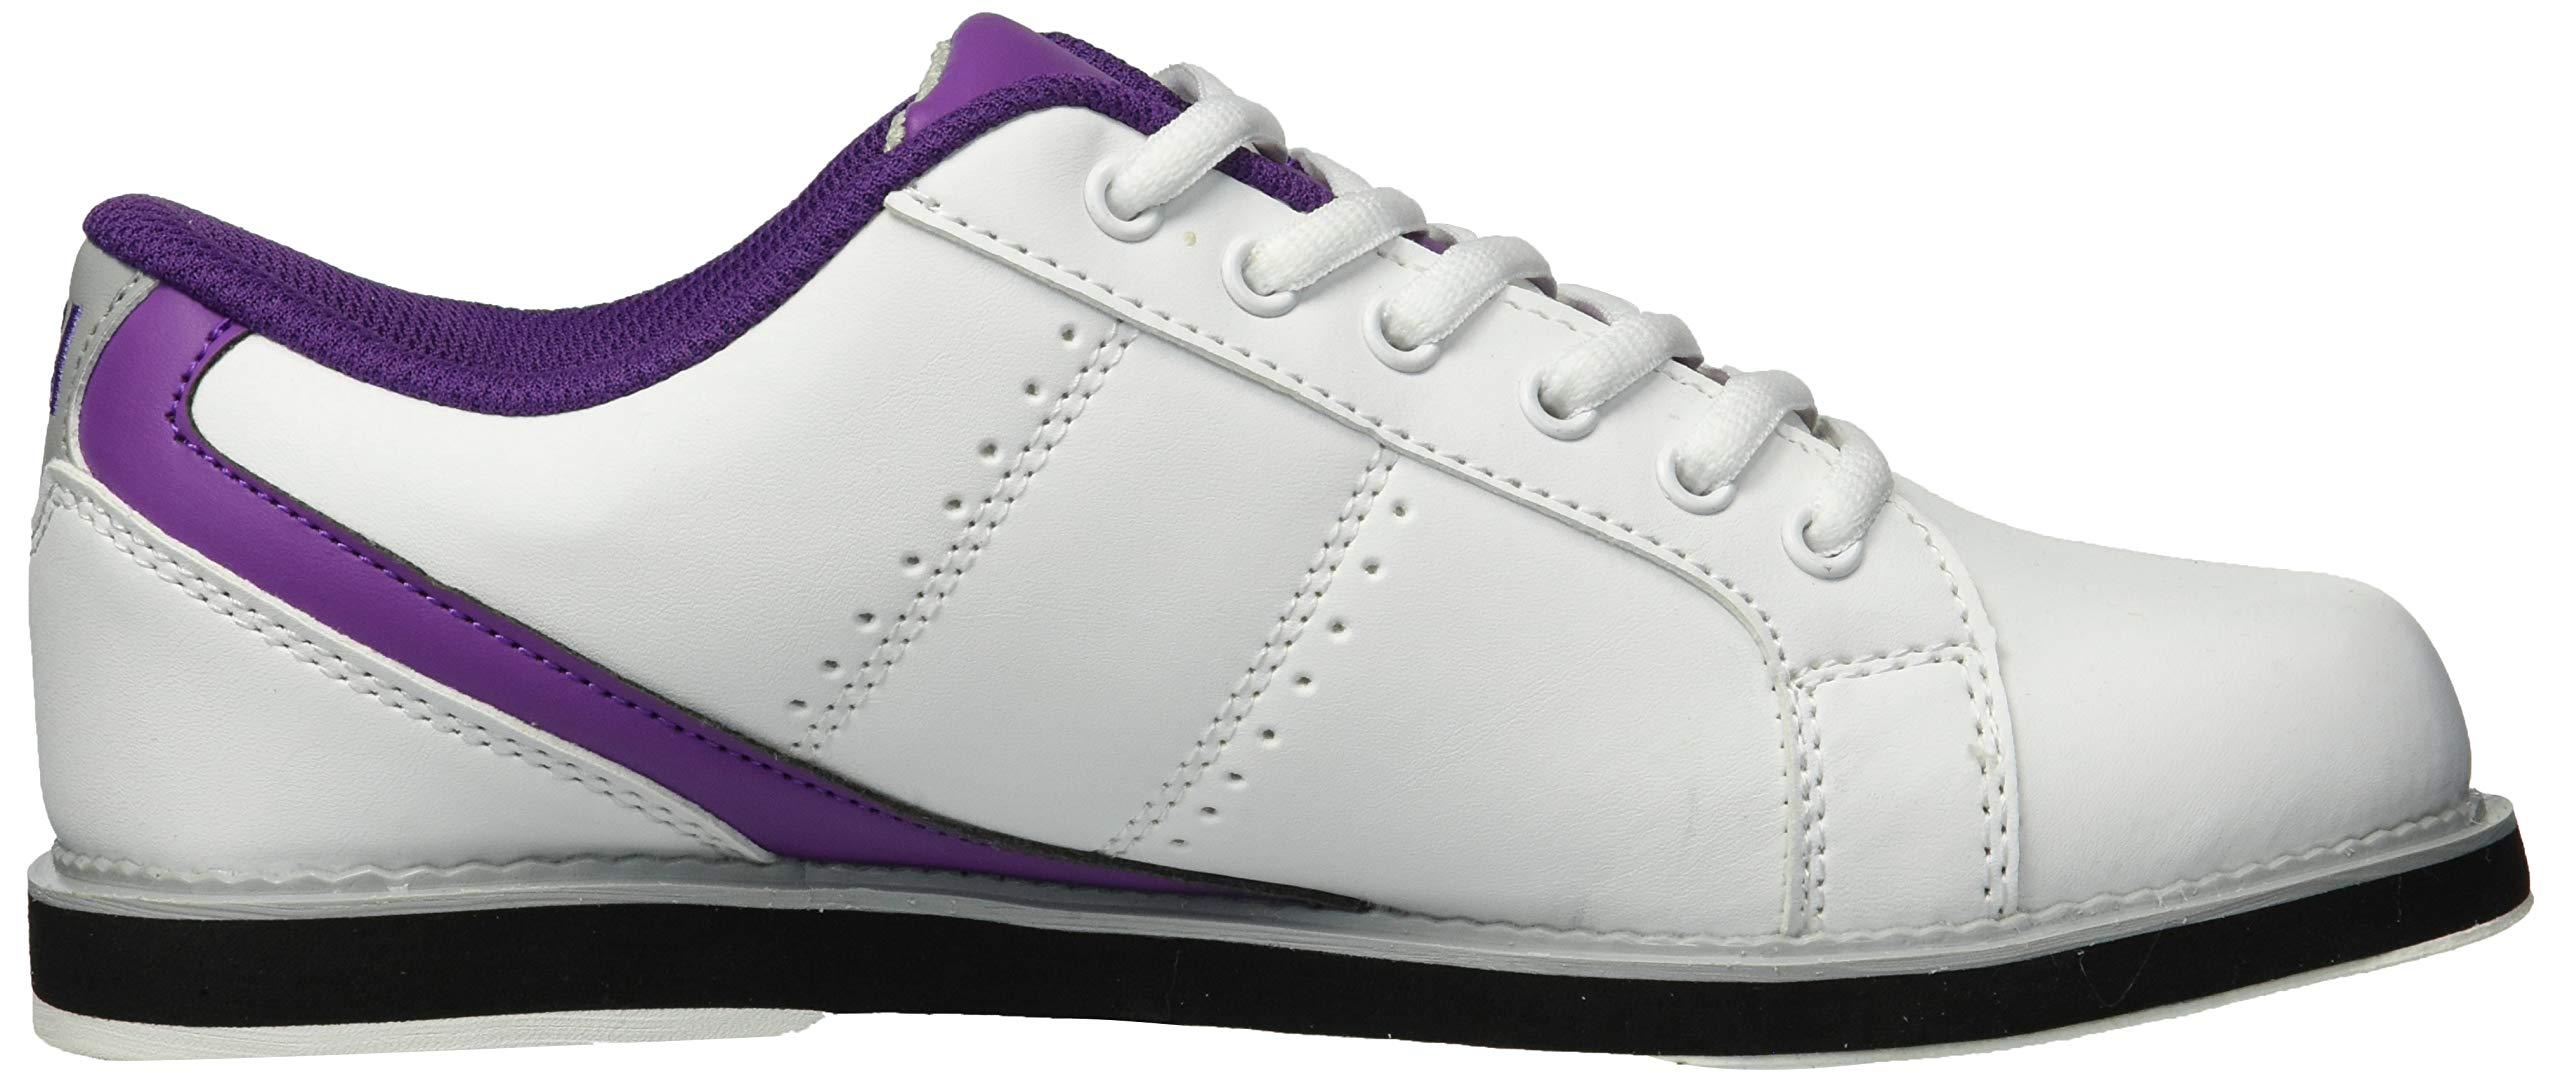 BSI Women's 460 Bowling Shoe, White/Purple, Size 10 by BSI (Image #7)